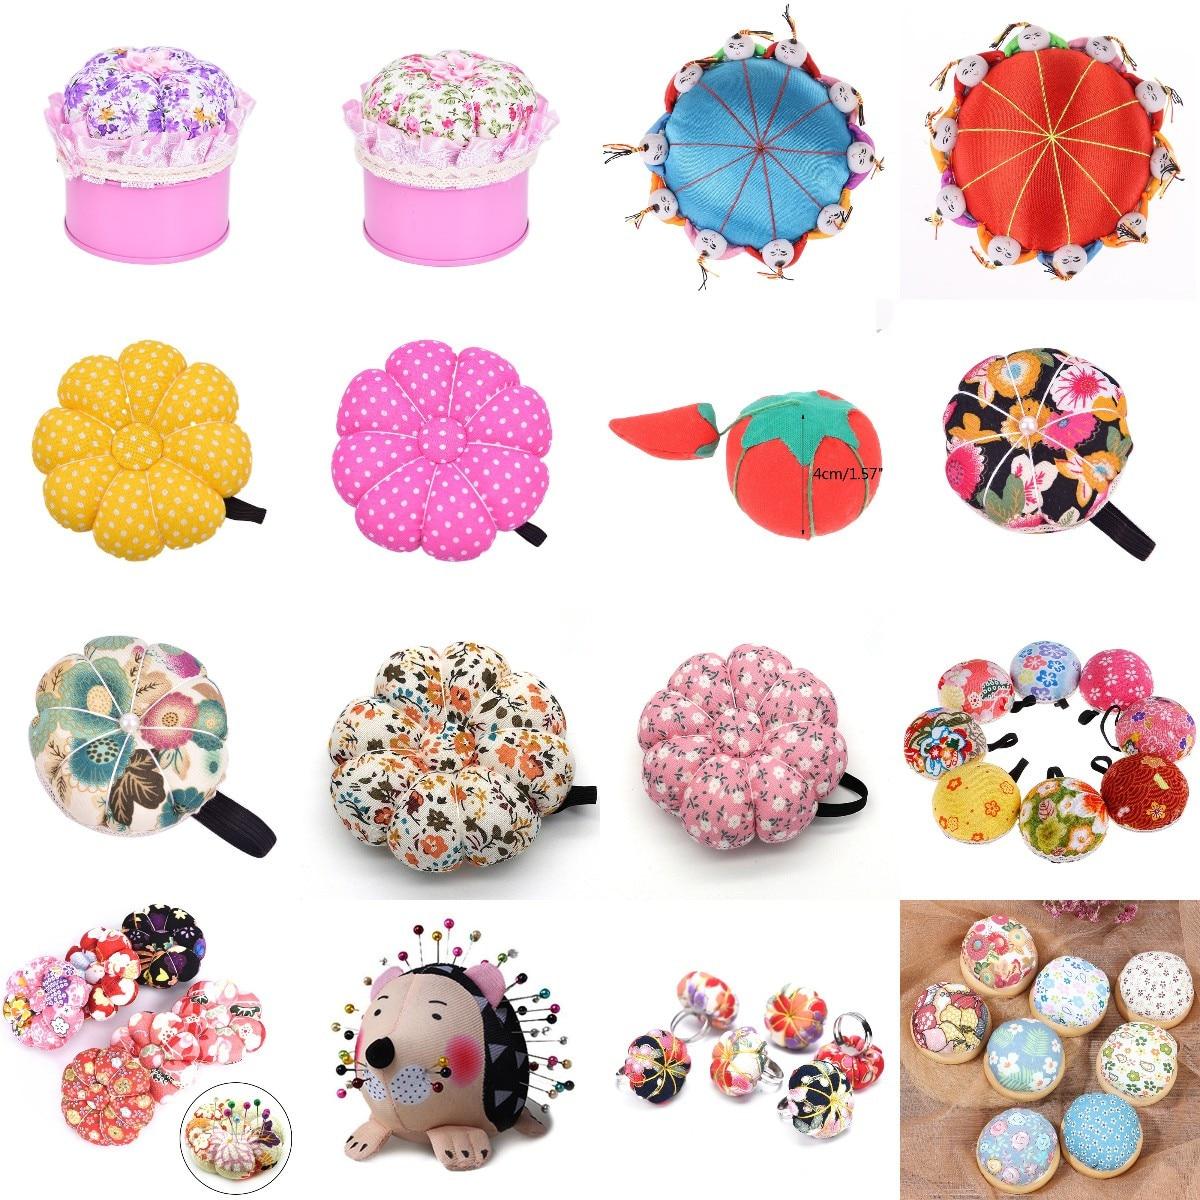 1Pc Ball Shaped DIY Craft Needle Pin Cushion Holder Sewing Kit Pincushions Wrist Strap Pin Cushion Home Sewing Supplies New